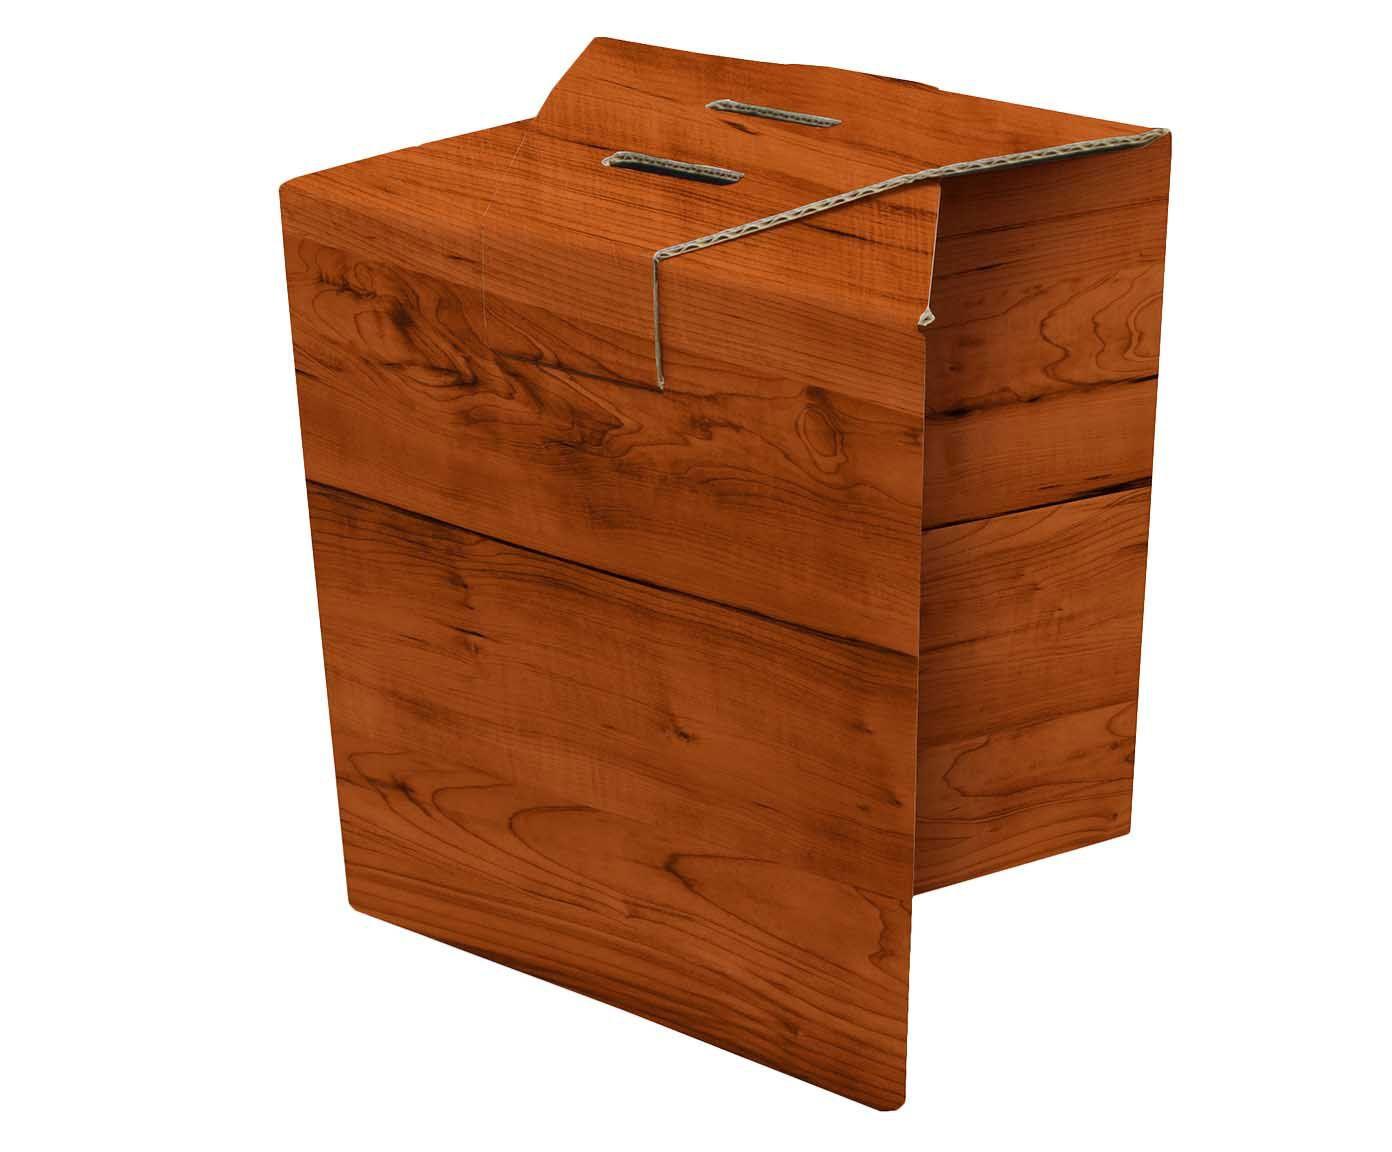 Banco rube wood | Westwing.com.br